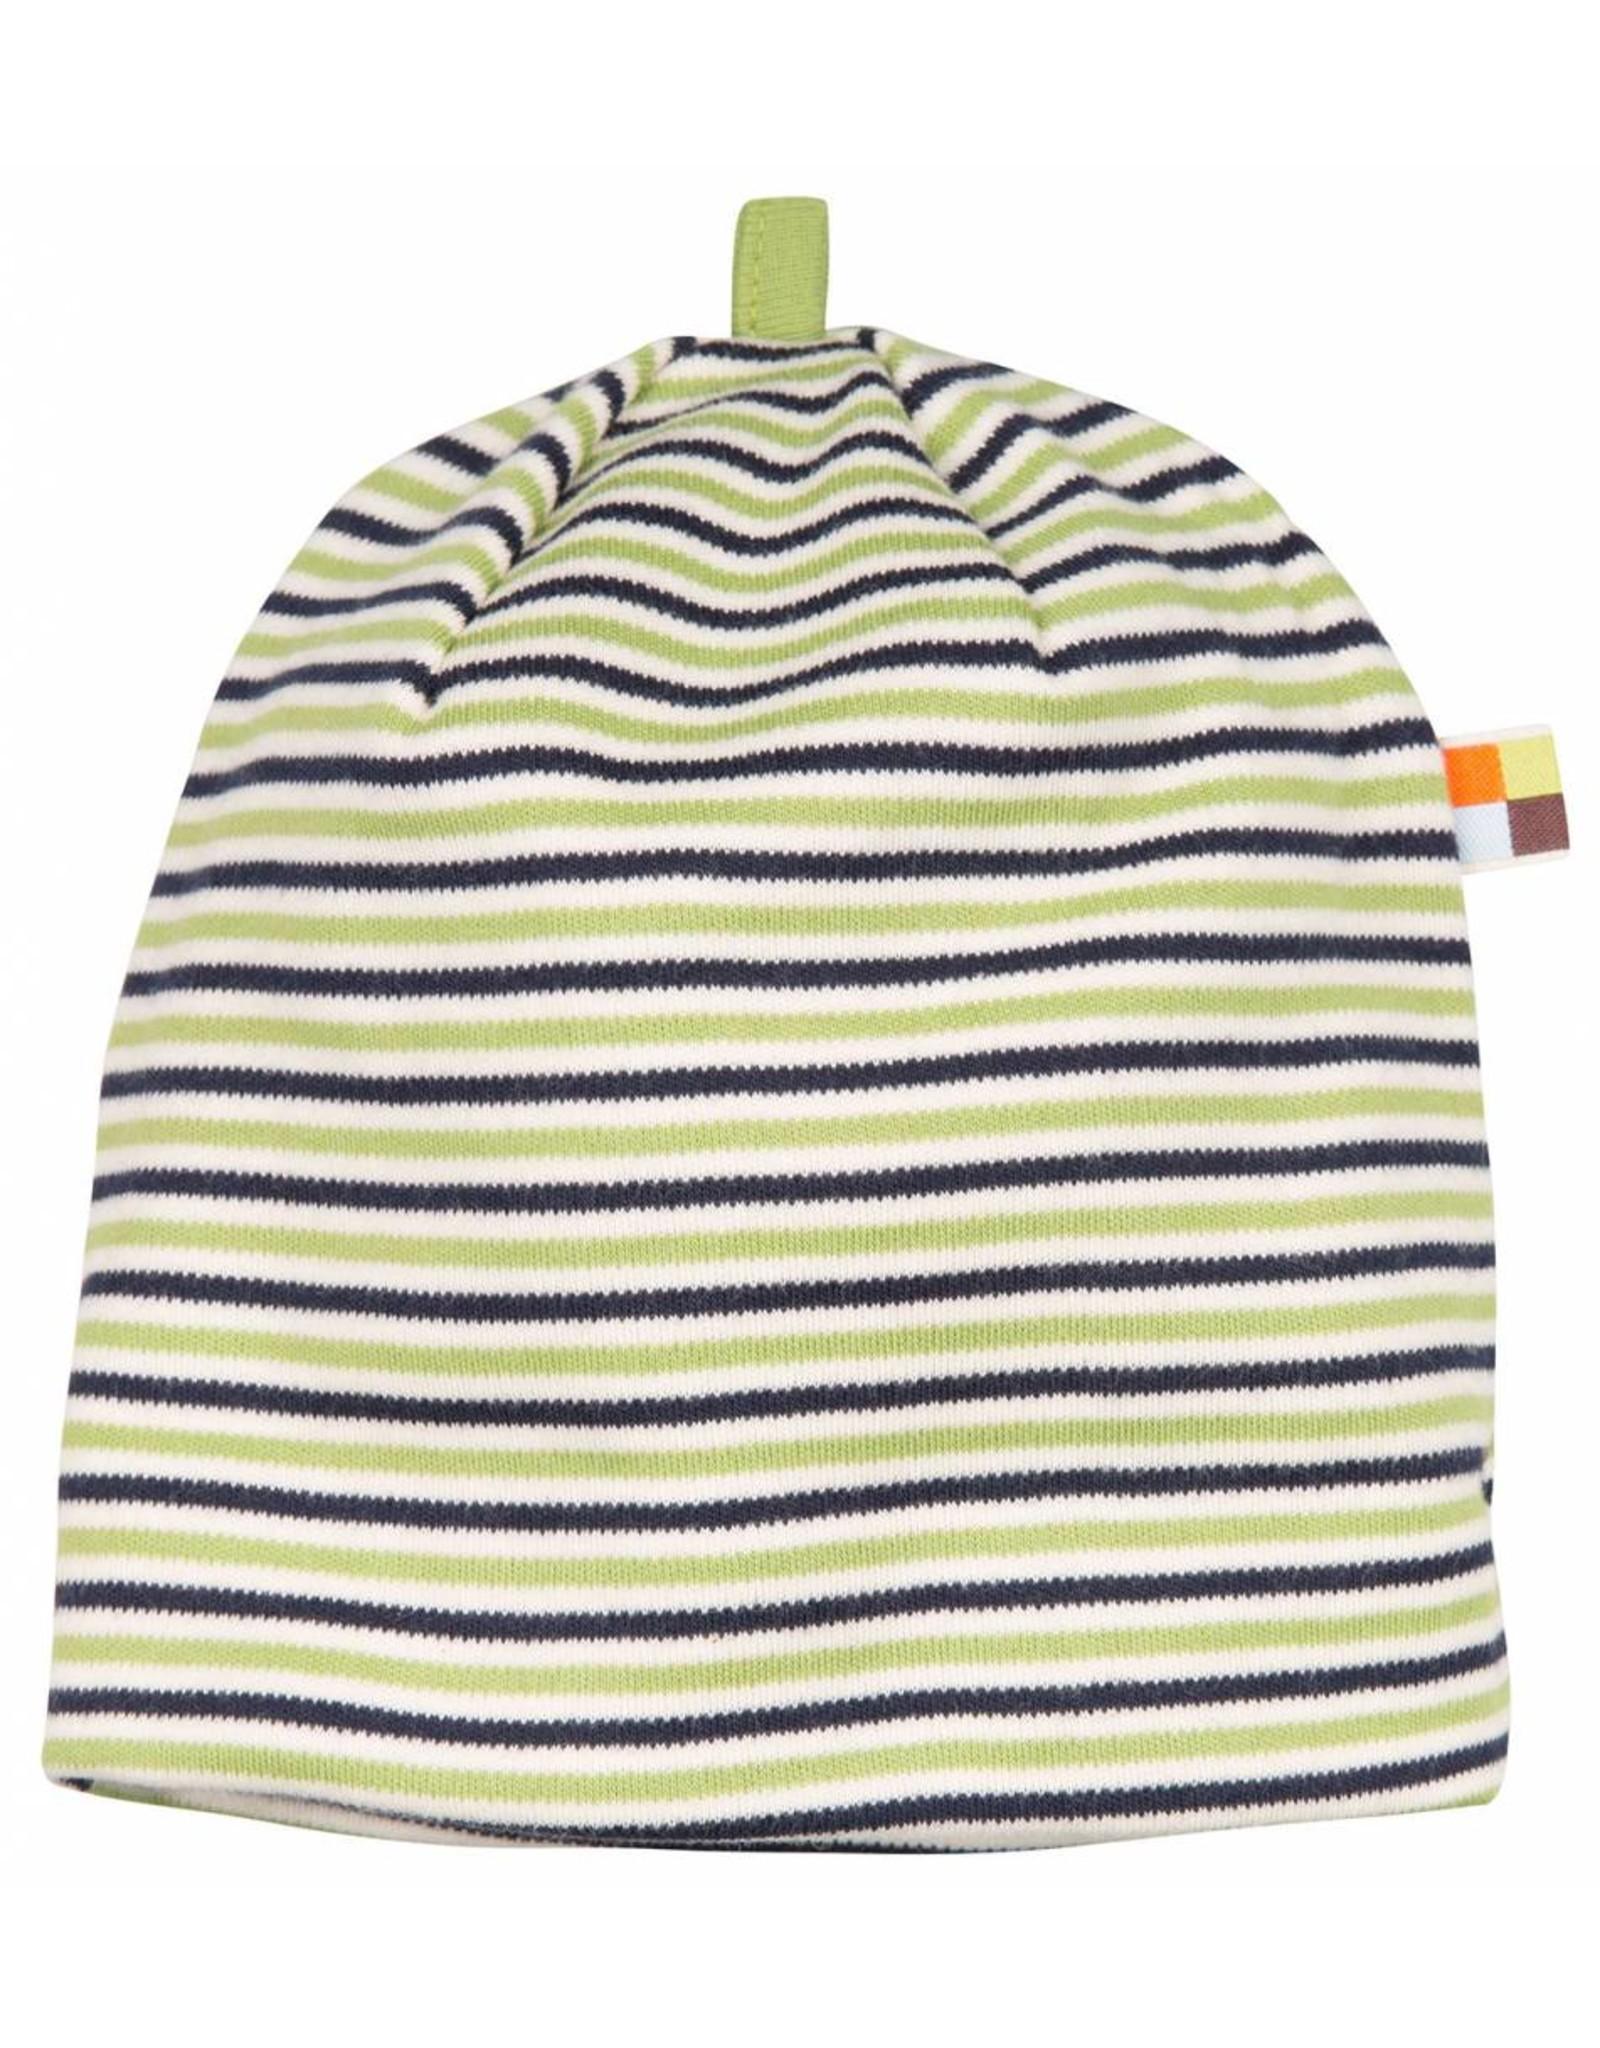 loud+proud Children's hat - green blue stripes